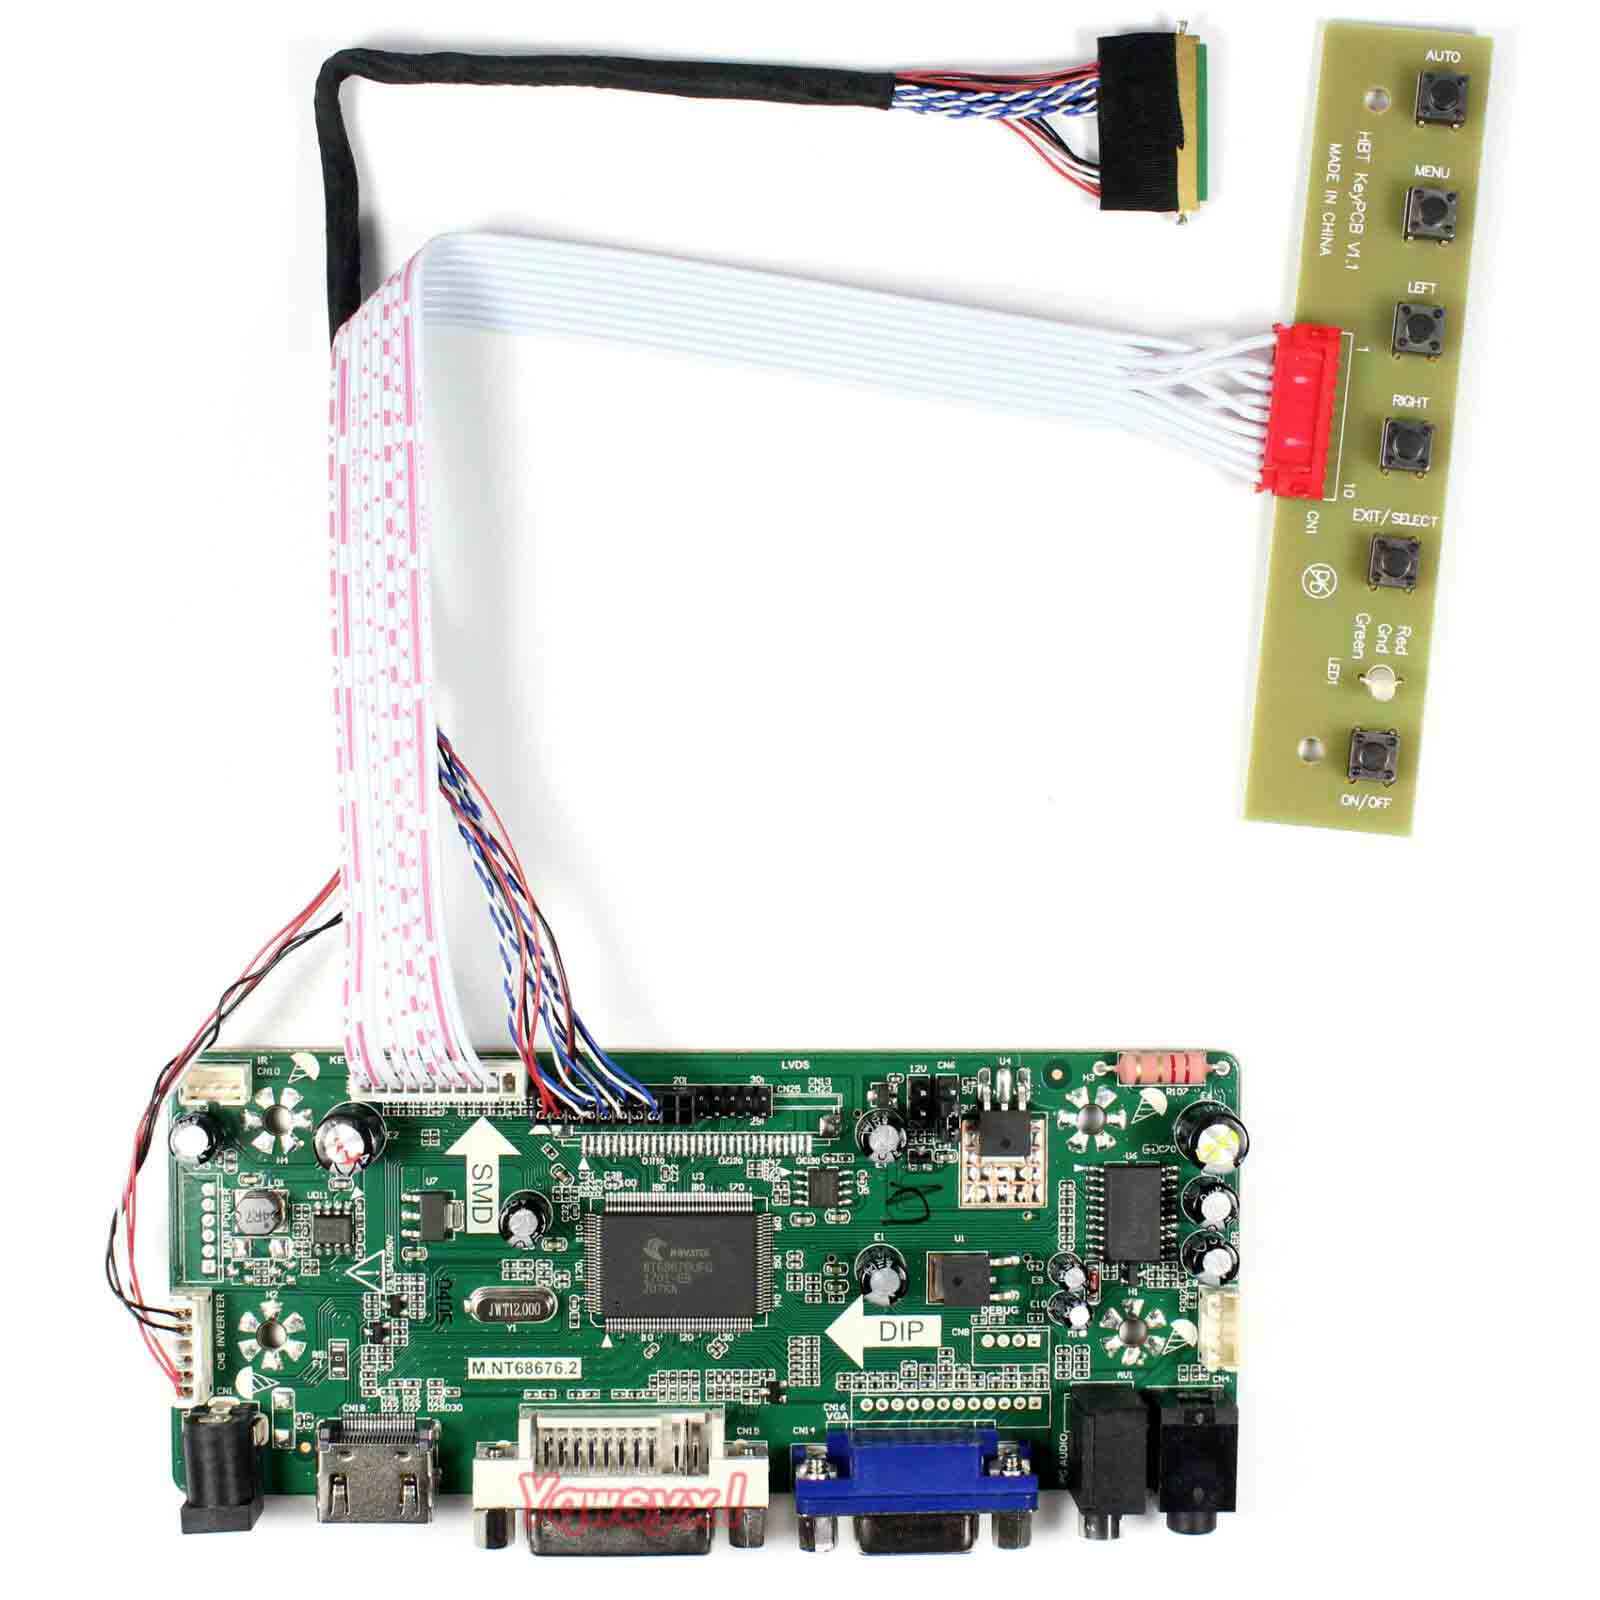 Yqwsyxl Control Board Monitor Kit For B156XW04 V.1 V1   B156XW04 V.6 V6 HDMI+DVI+VGA LCD LED Screen Controller Board Driver